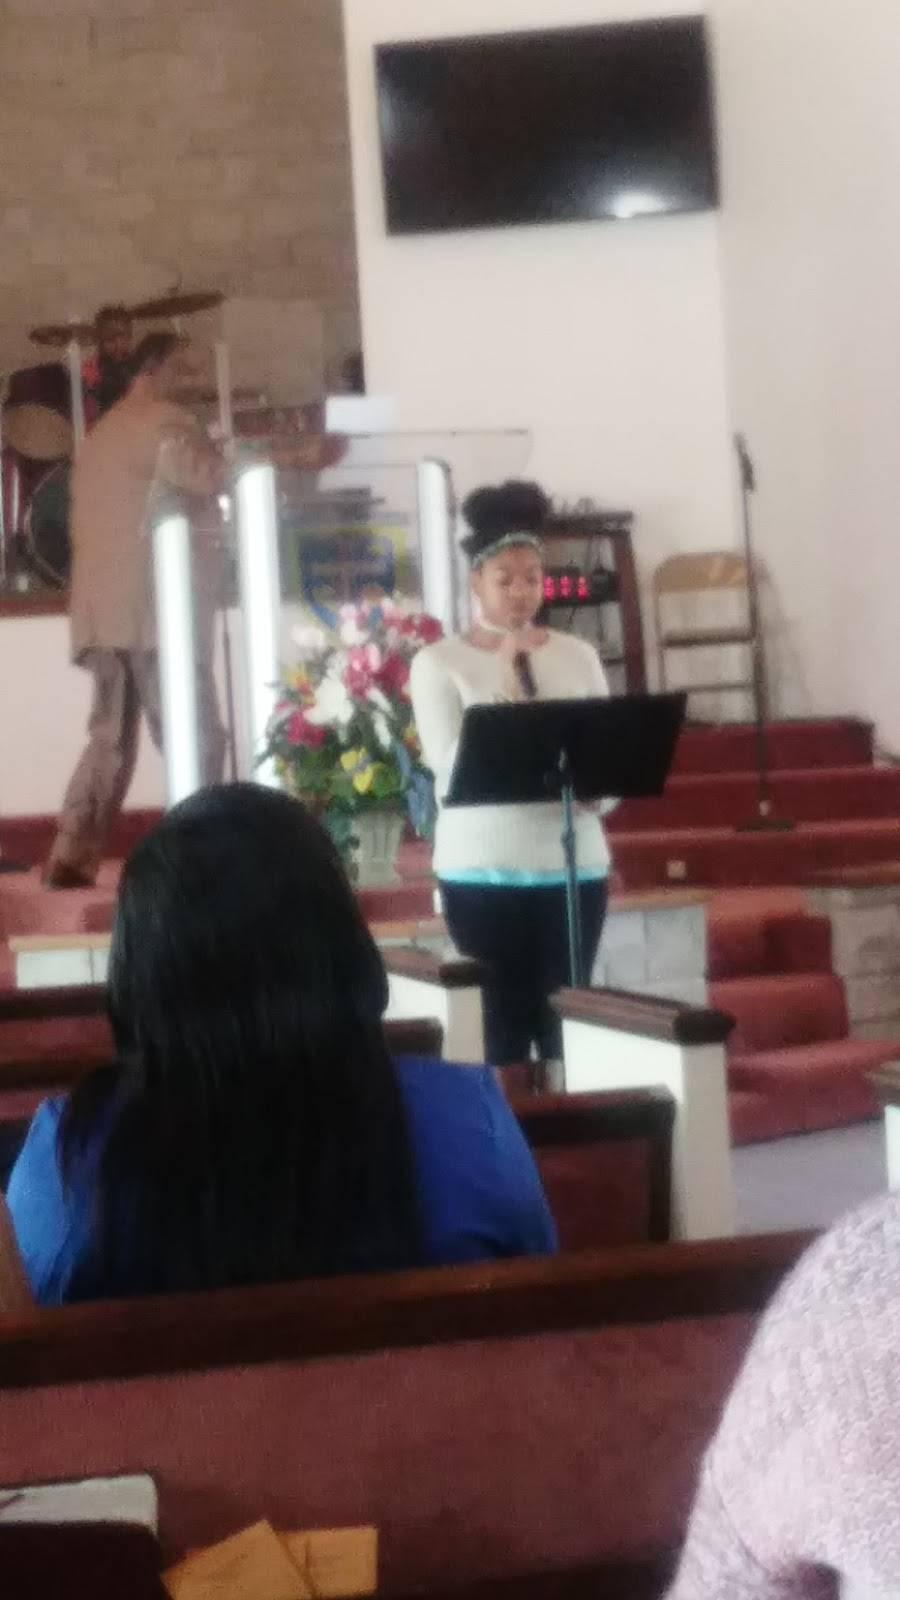 Agape Fellowship Center - church  | Photo 1 of 1 | Address: 1065 Mullanphy Rd, Florissant, MO 63031, USA | Phone: (314) 497-9145